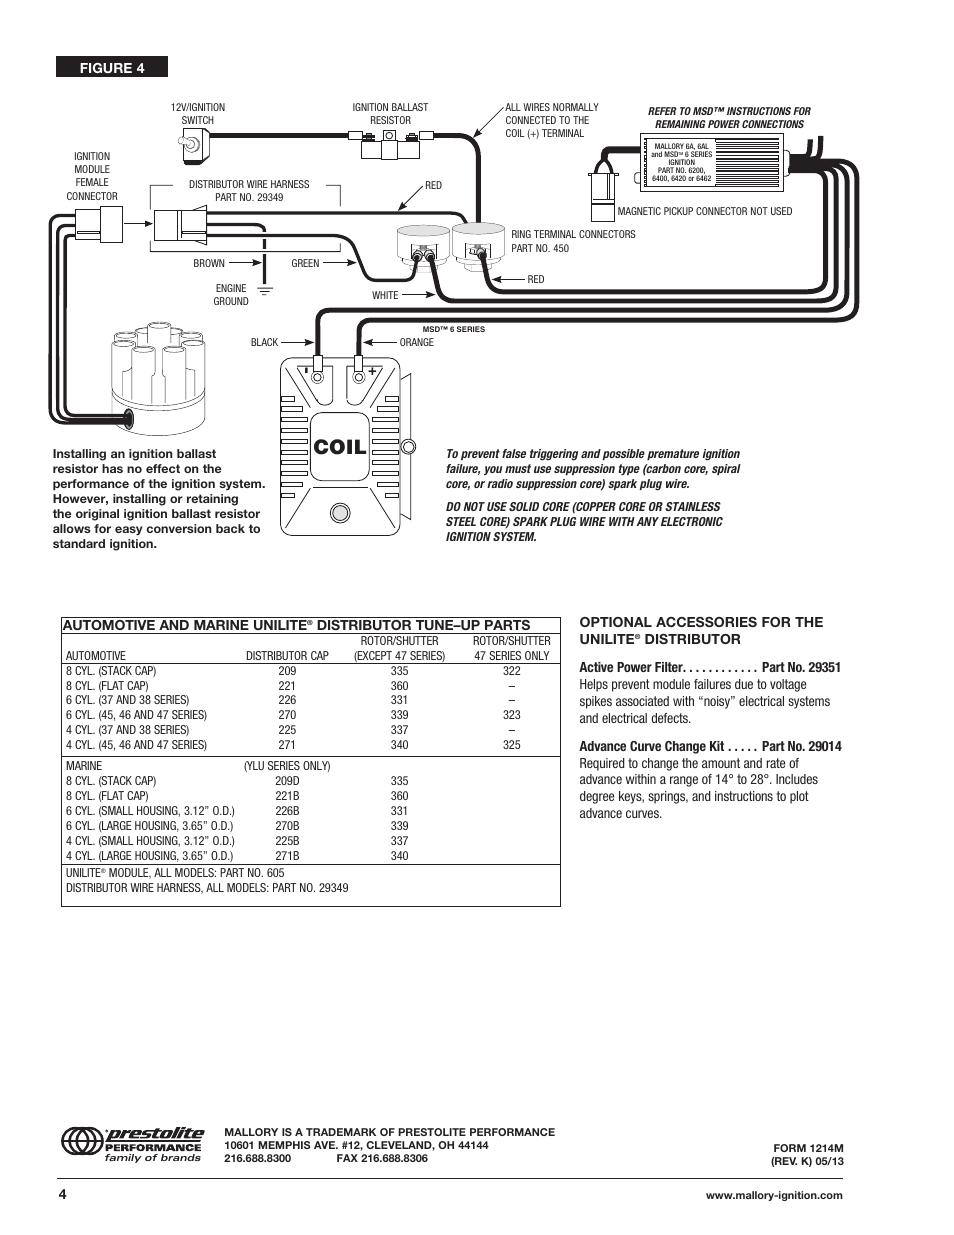 Mallory ignition distributor wiring diagram on mallory wiring harness tow hitch wiring diagram b20b engine diagram Mallory Coil Wire Diagram Mallory Carburetor Diagram